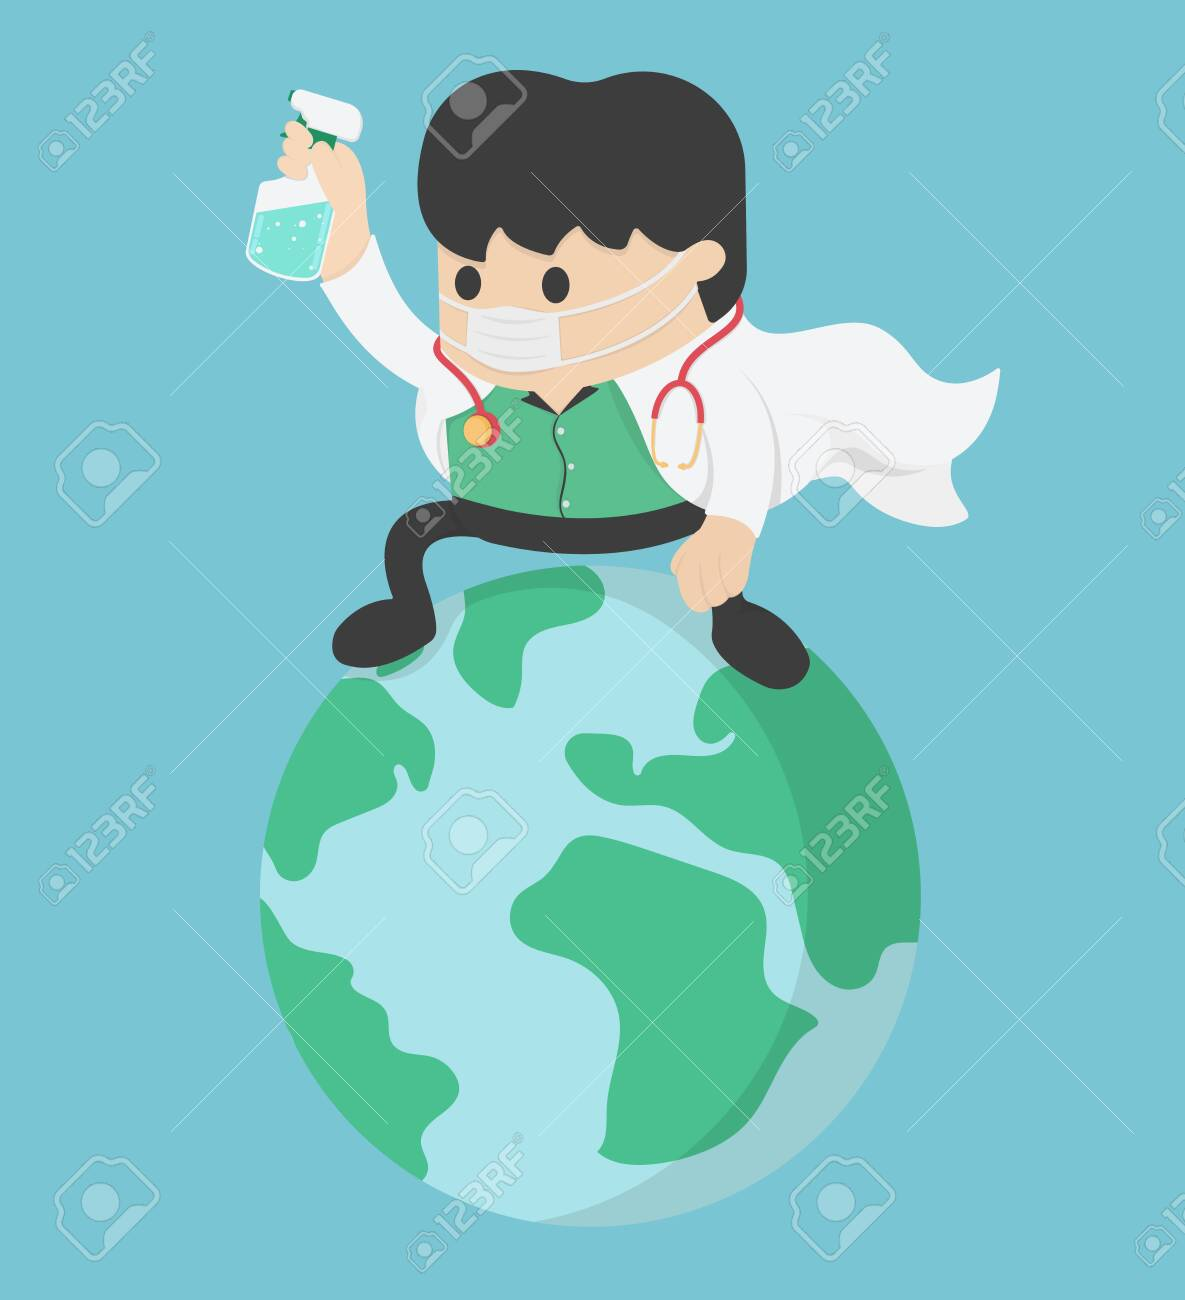 Coronavirus attack concept. doctor Save World. stop Covid-19 - 144133795